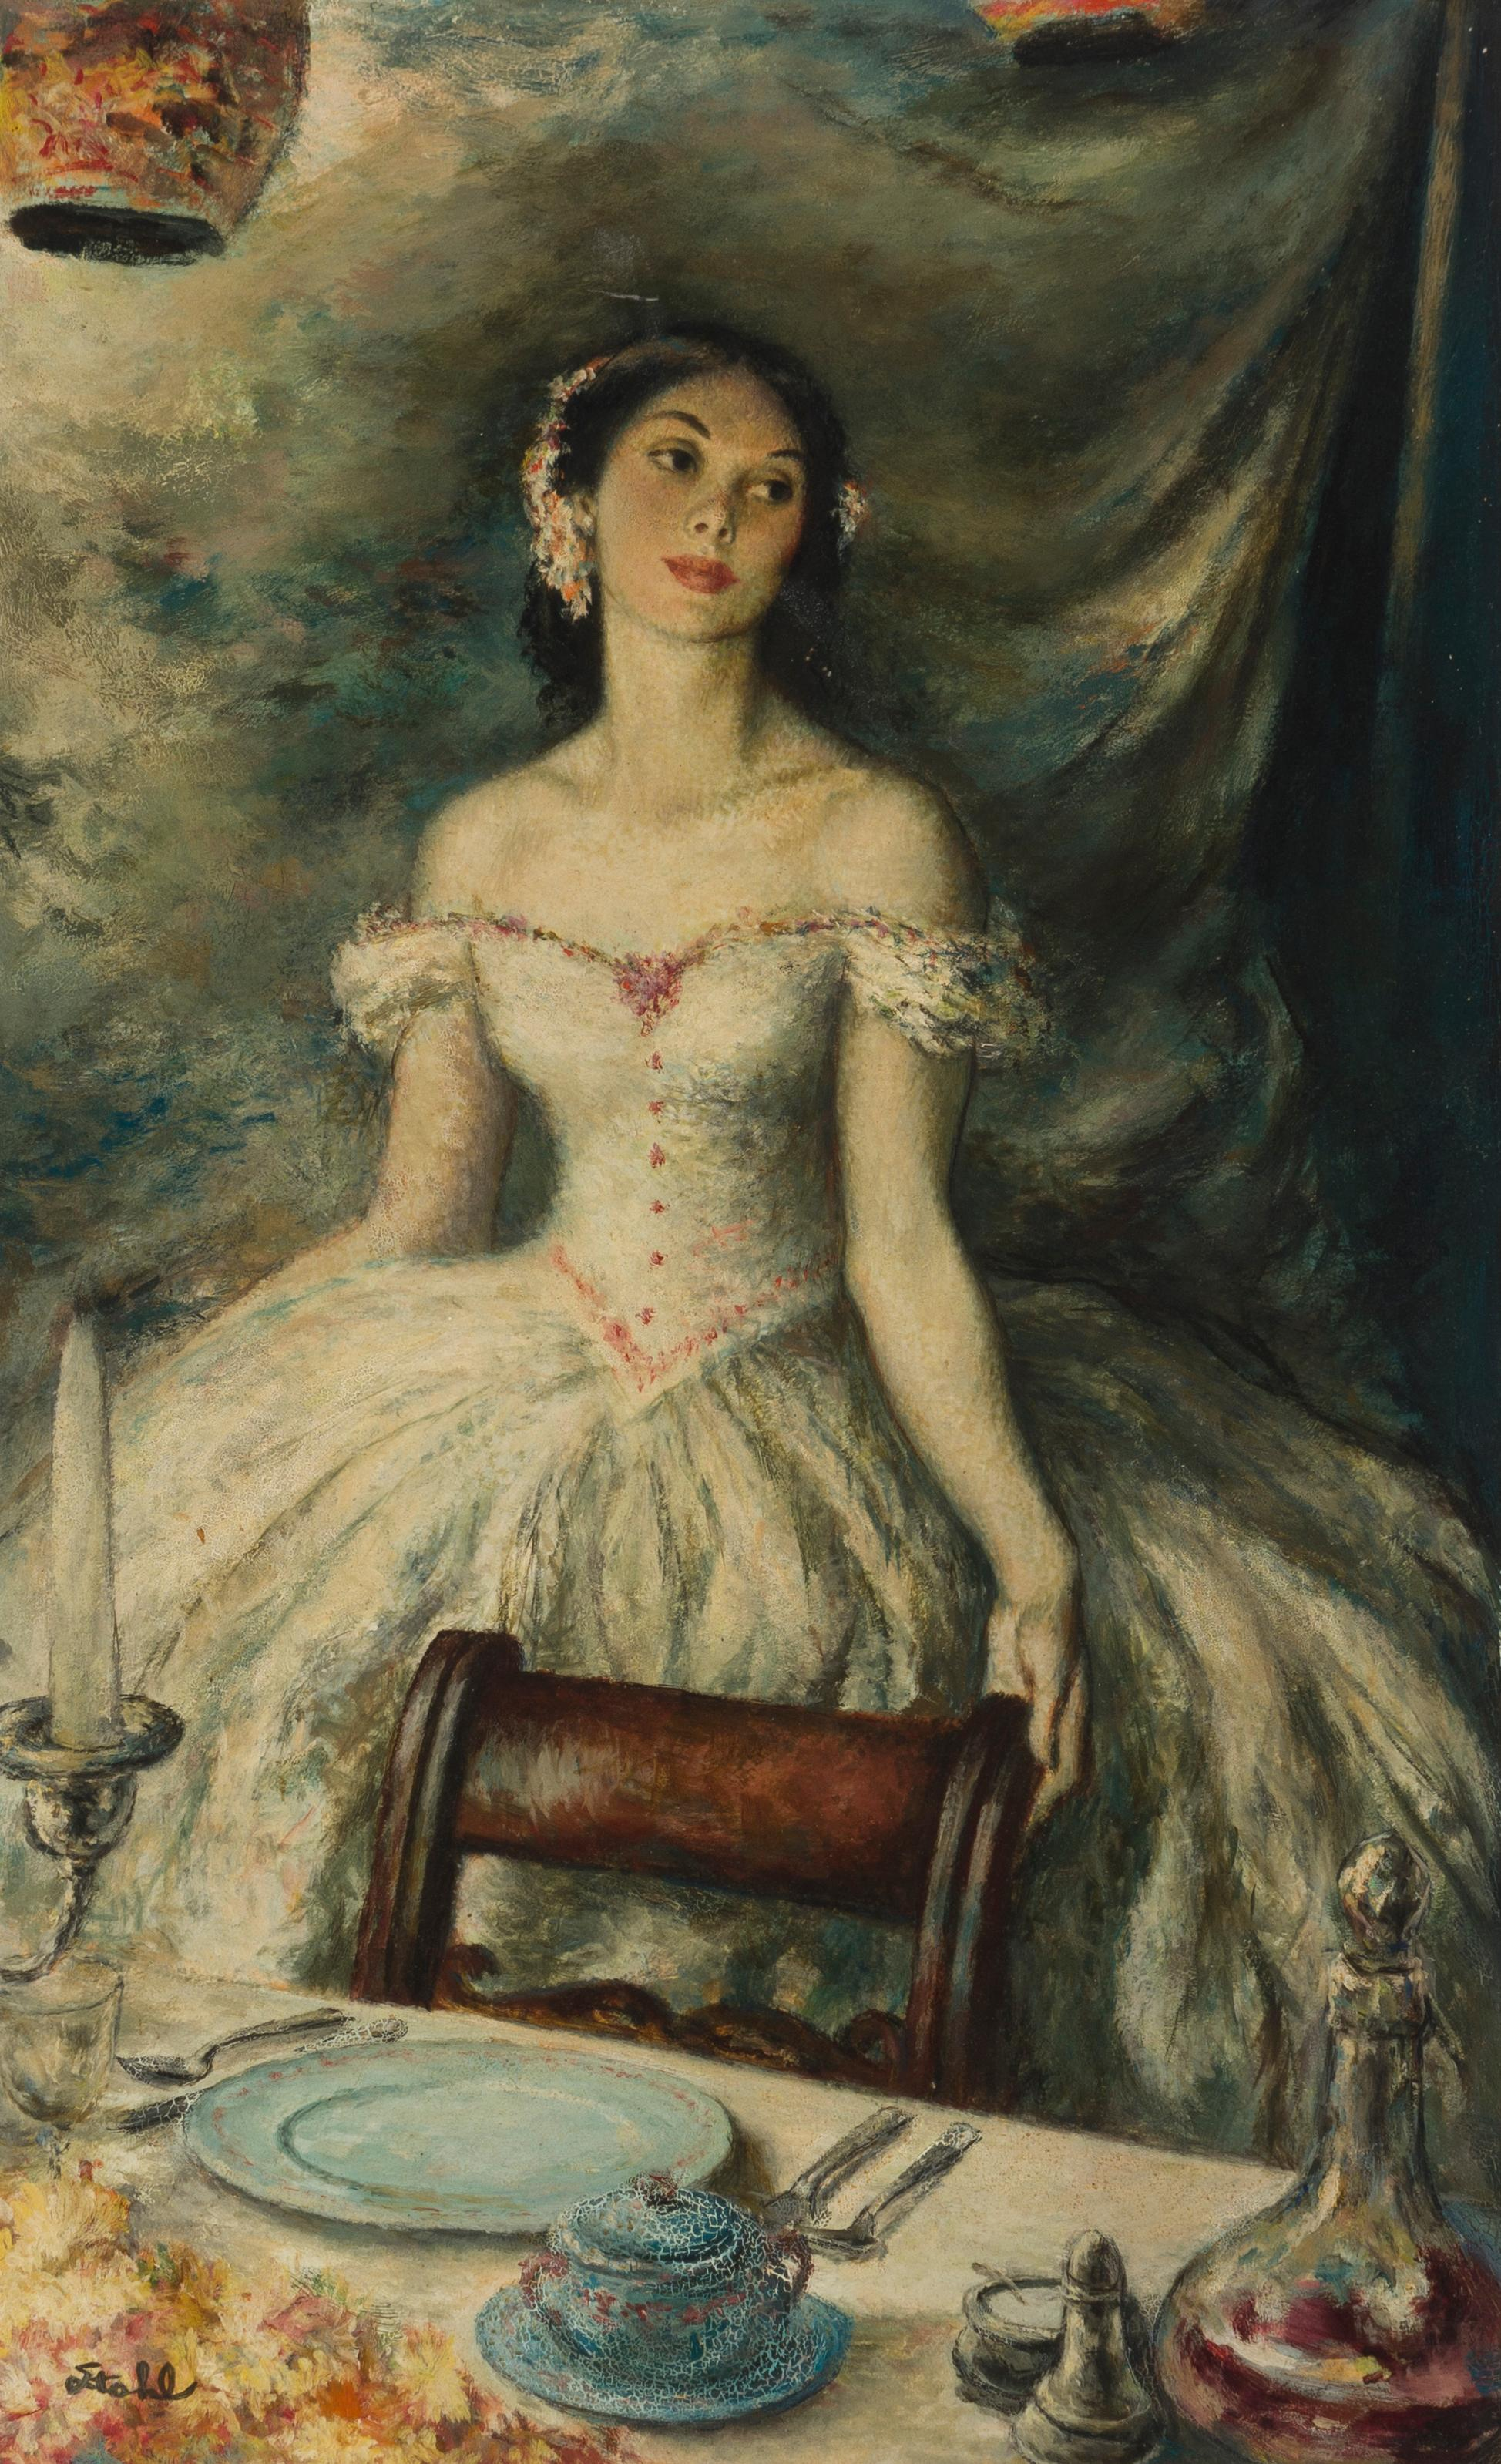 "Benjamin Stahl, (1910-1987 Sarasota, FL), Young woman in an interior, Oil on board, 20"" H x 12.25"" W"